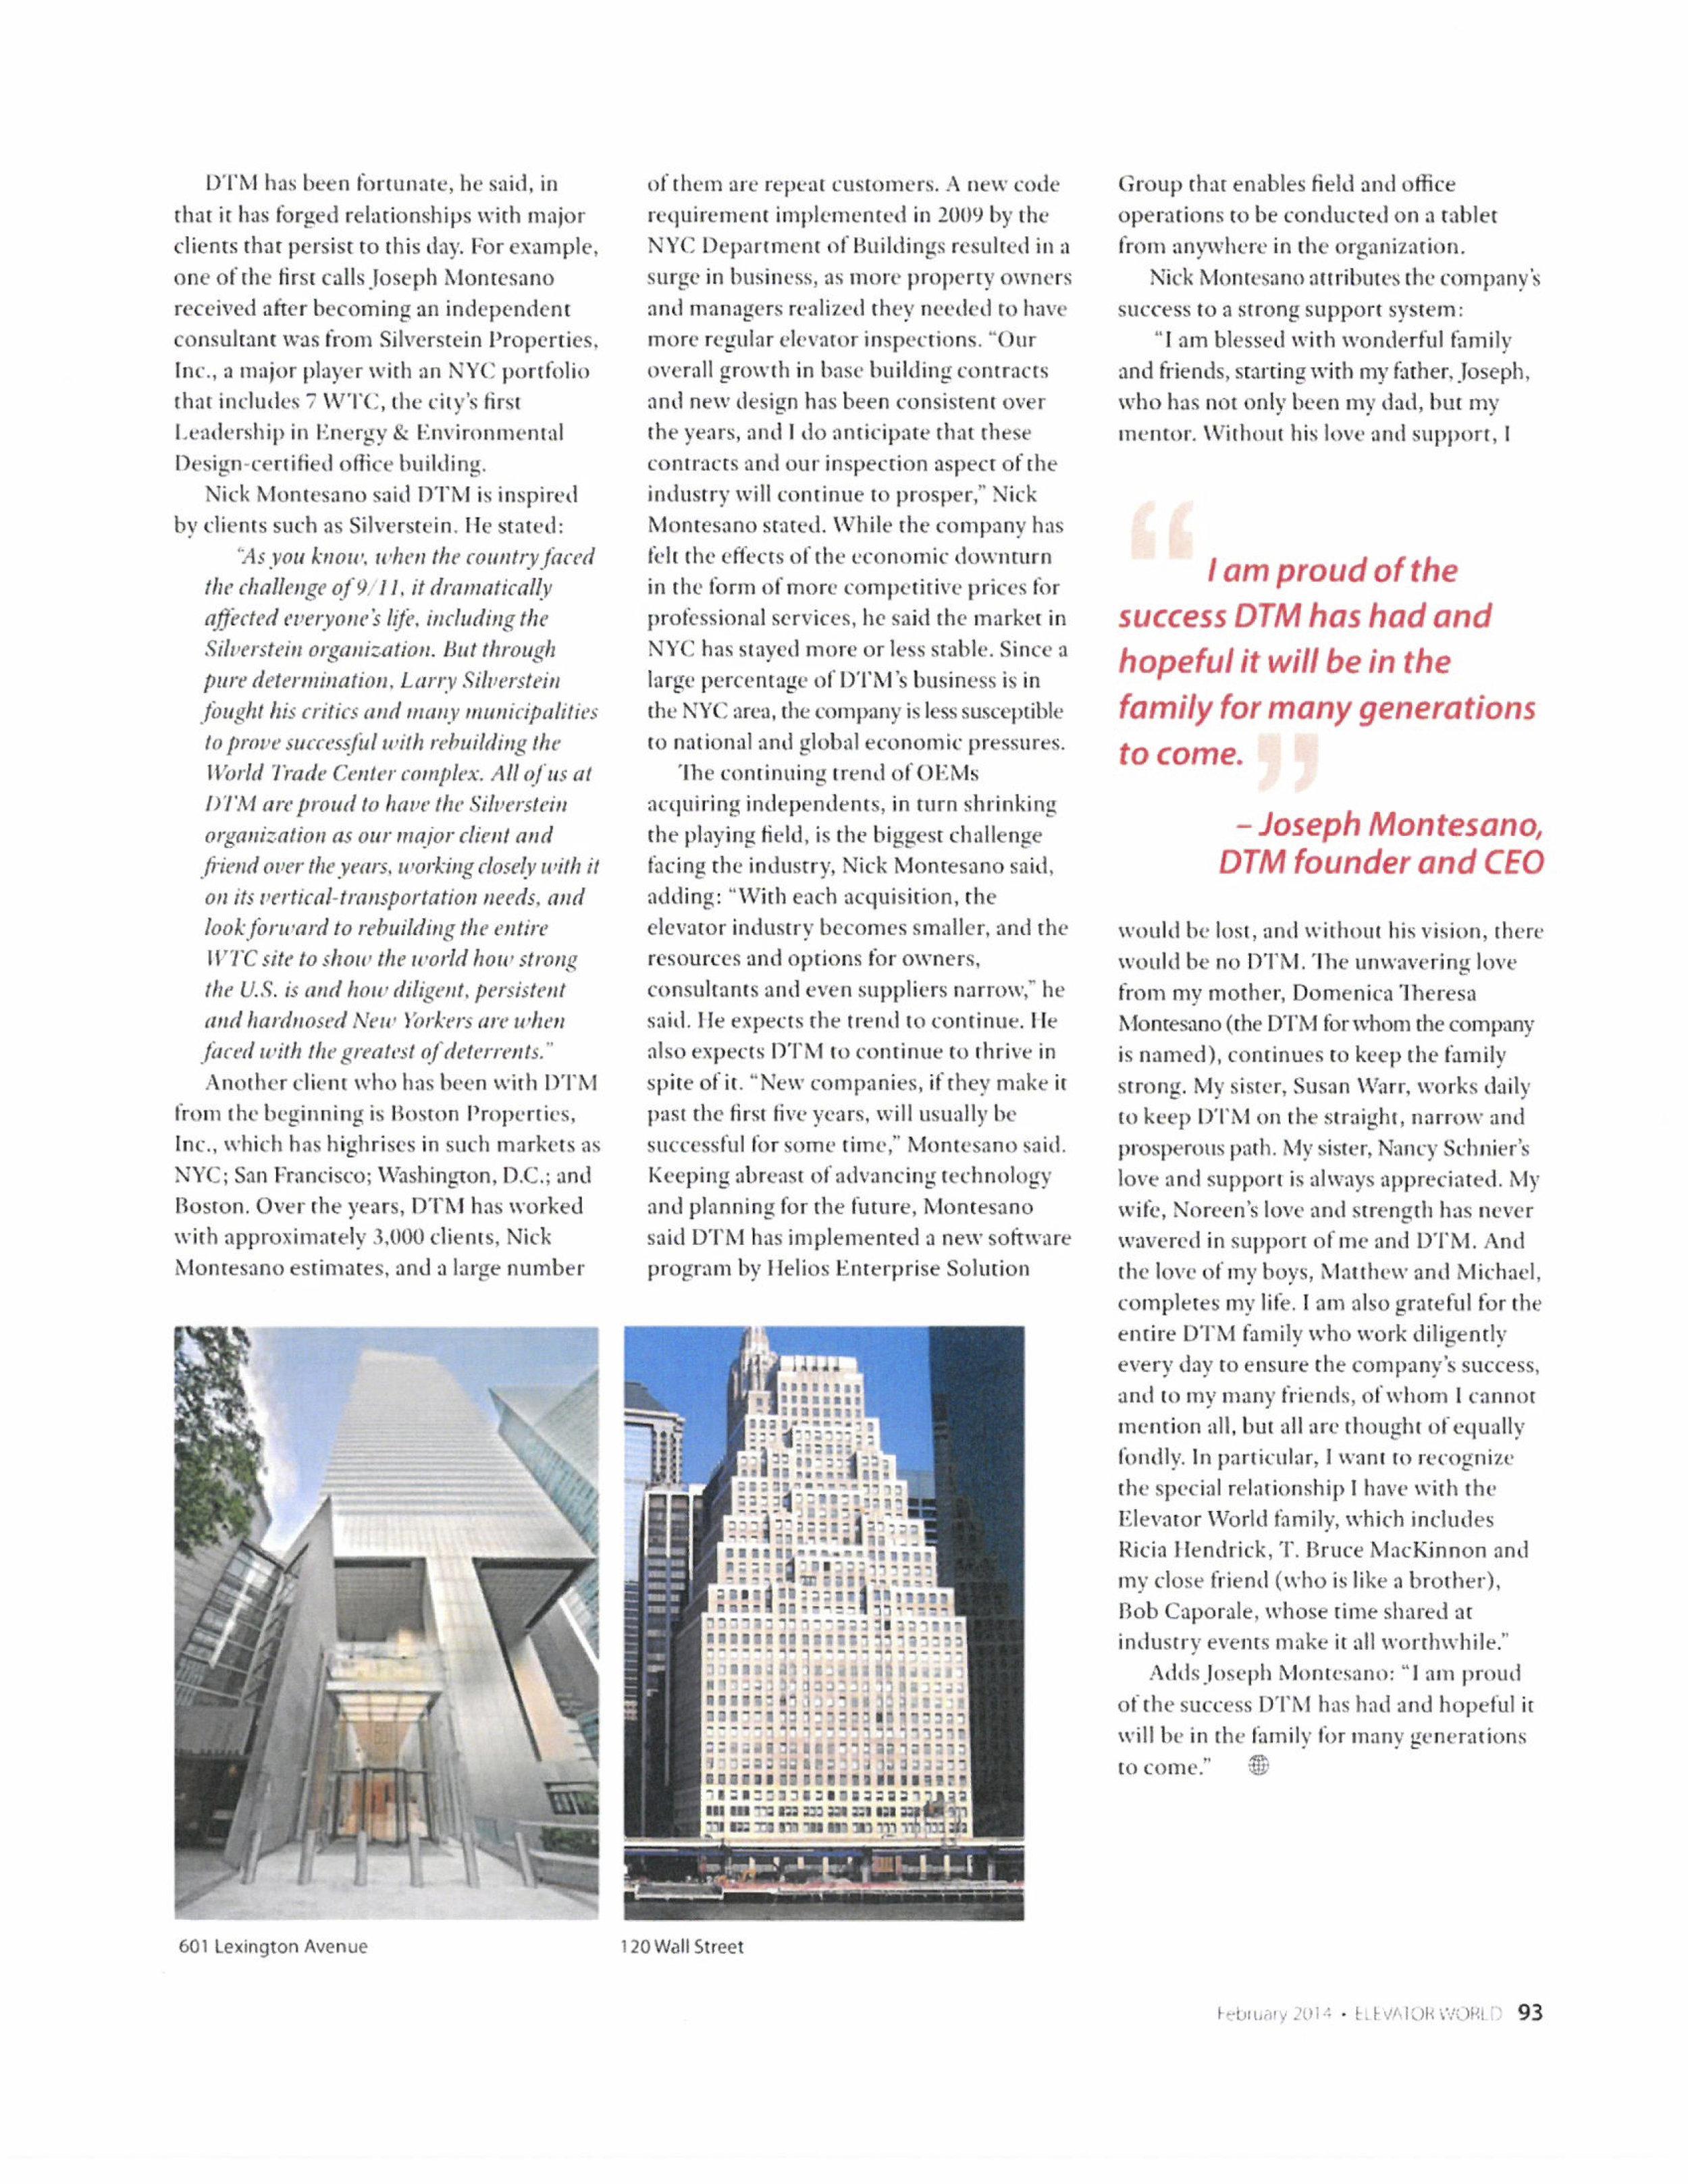 Elevator World Article on DTM 2014 3.jpg